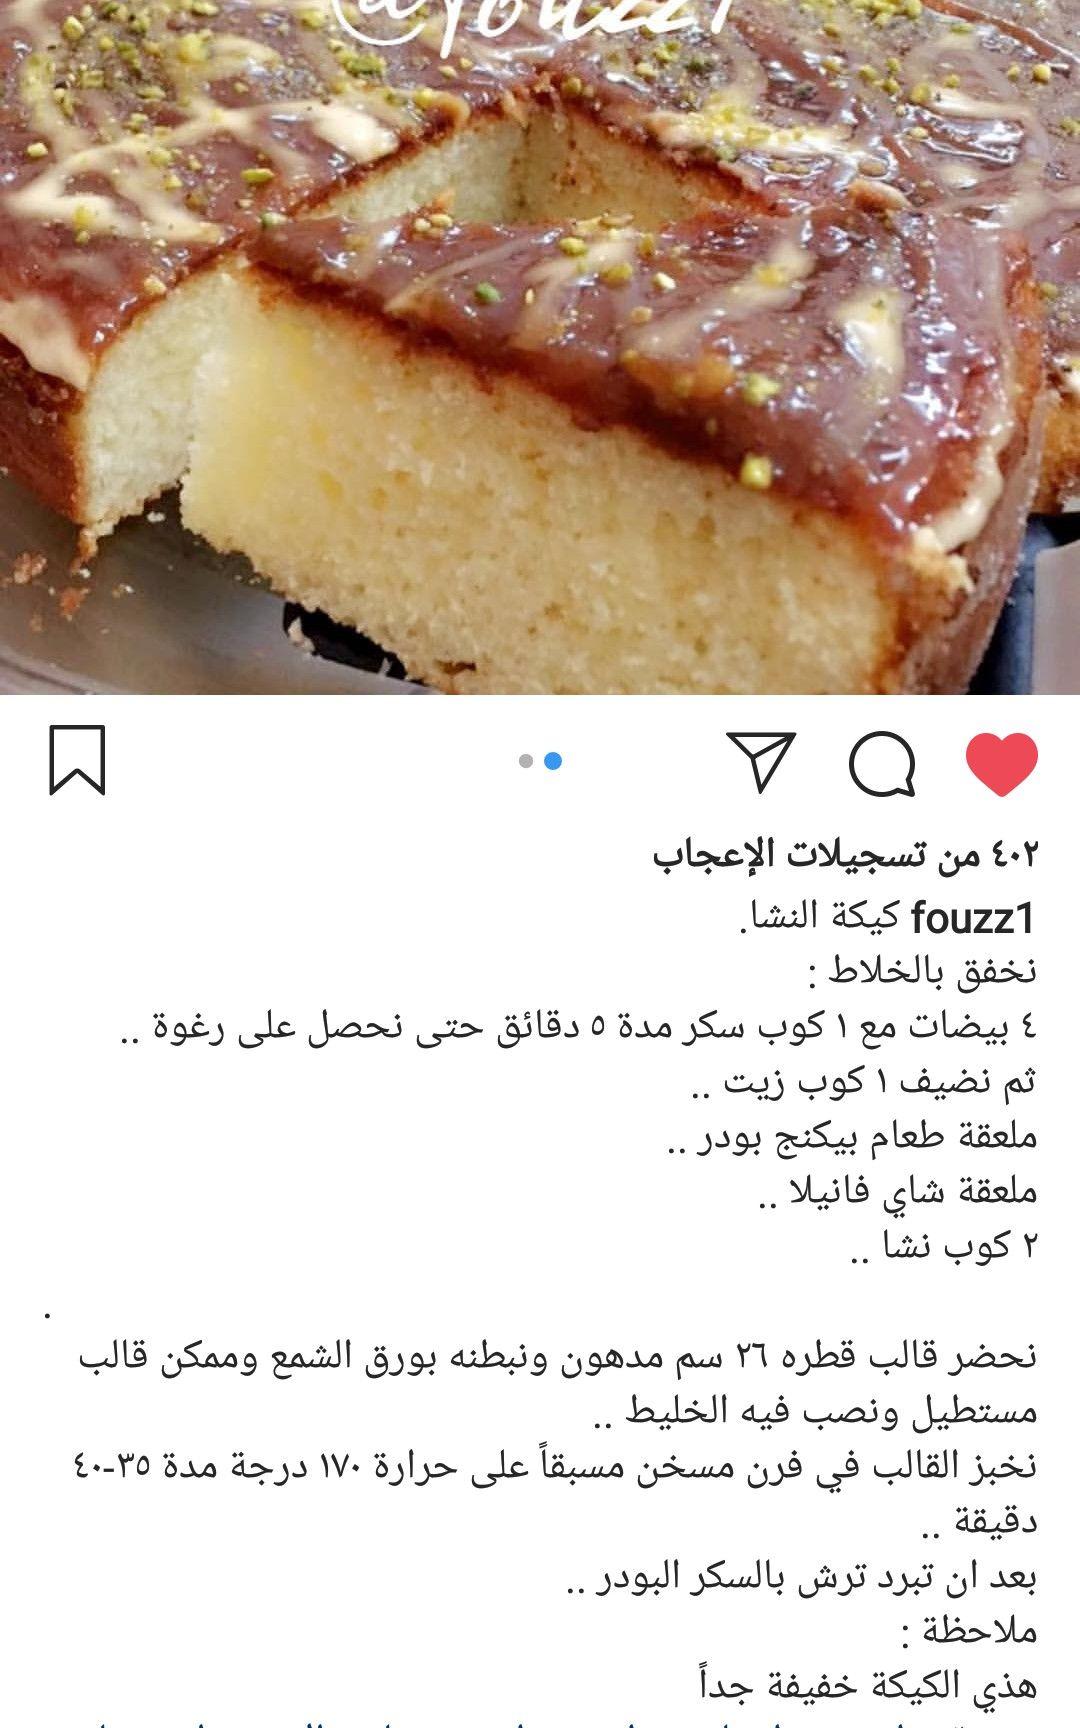 كيكه الفرني Lebanese Desserts Recipes Cooking Recipes Desserts Arabic Sweets Recipes